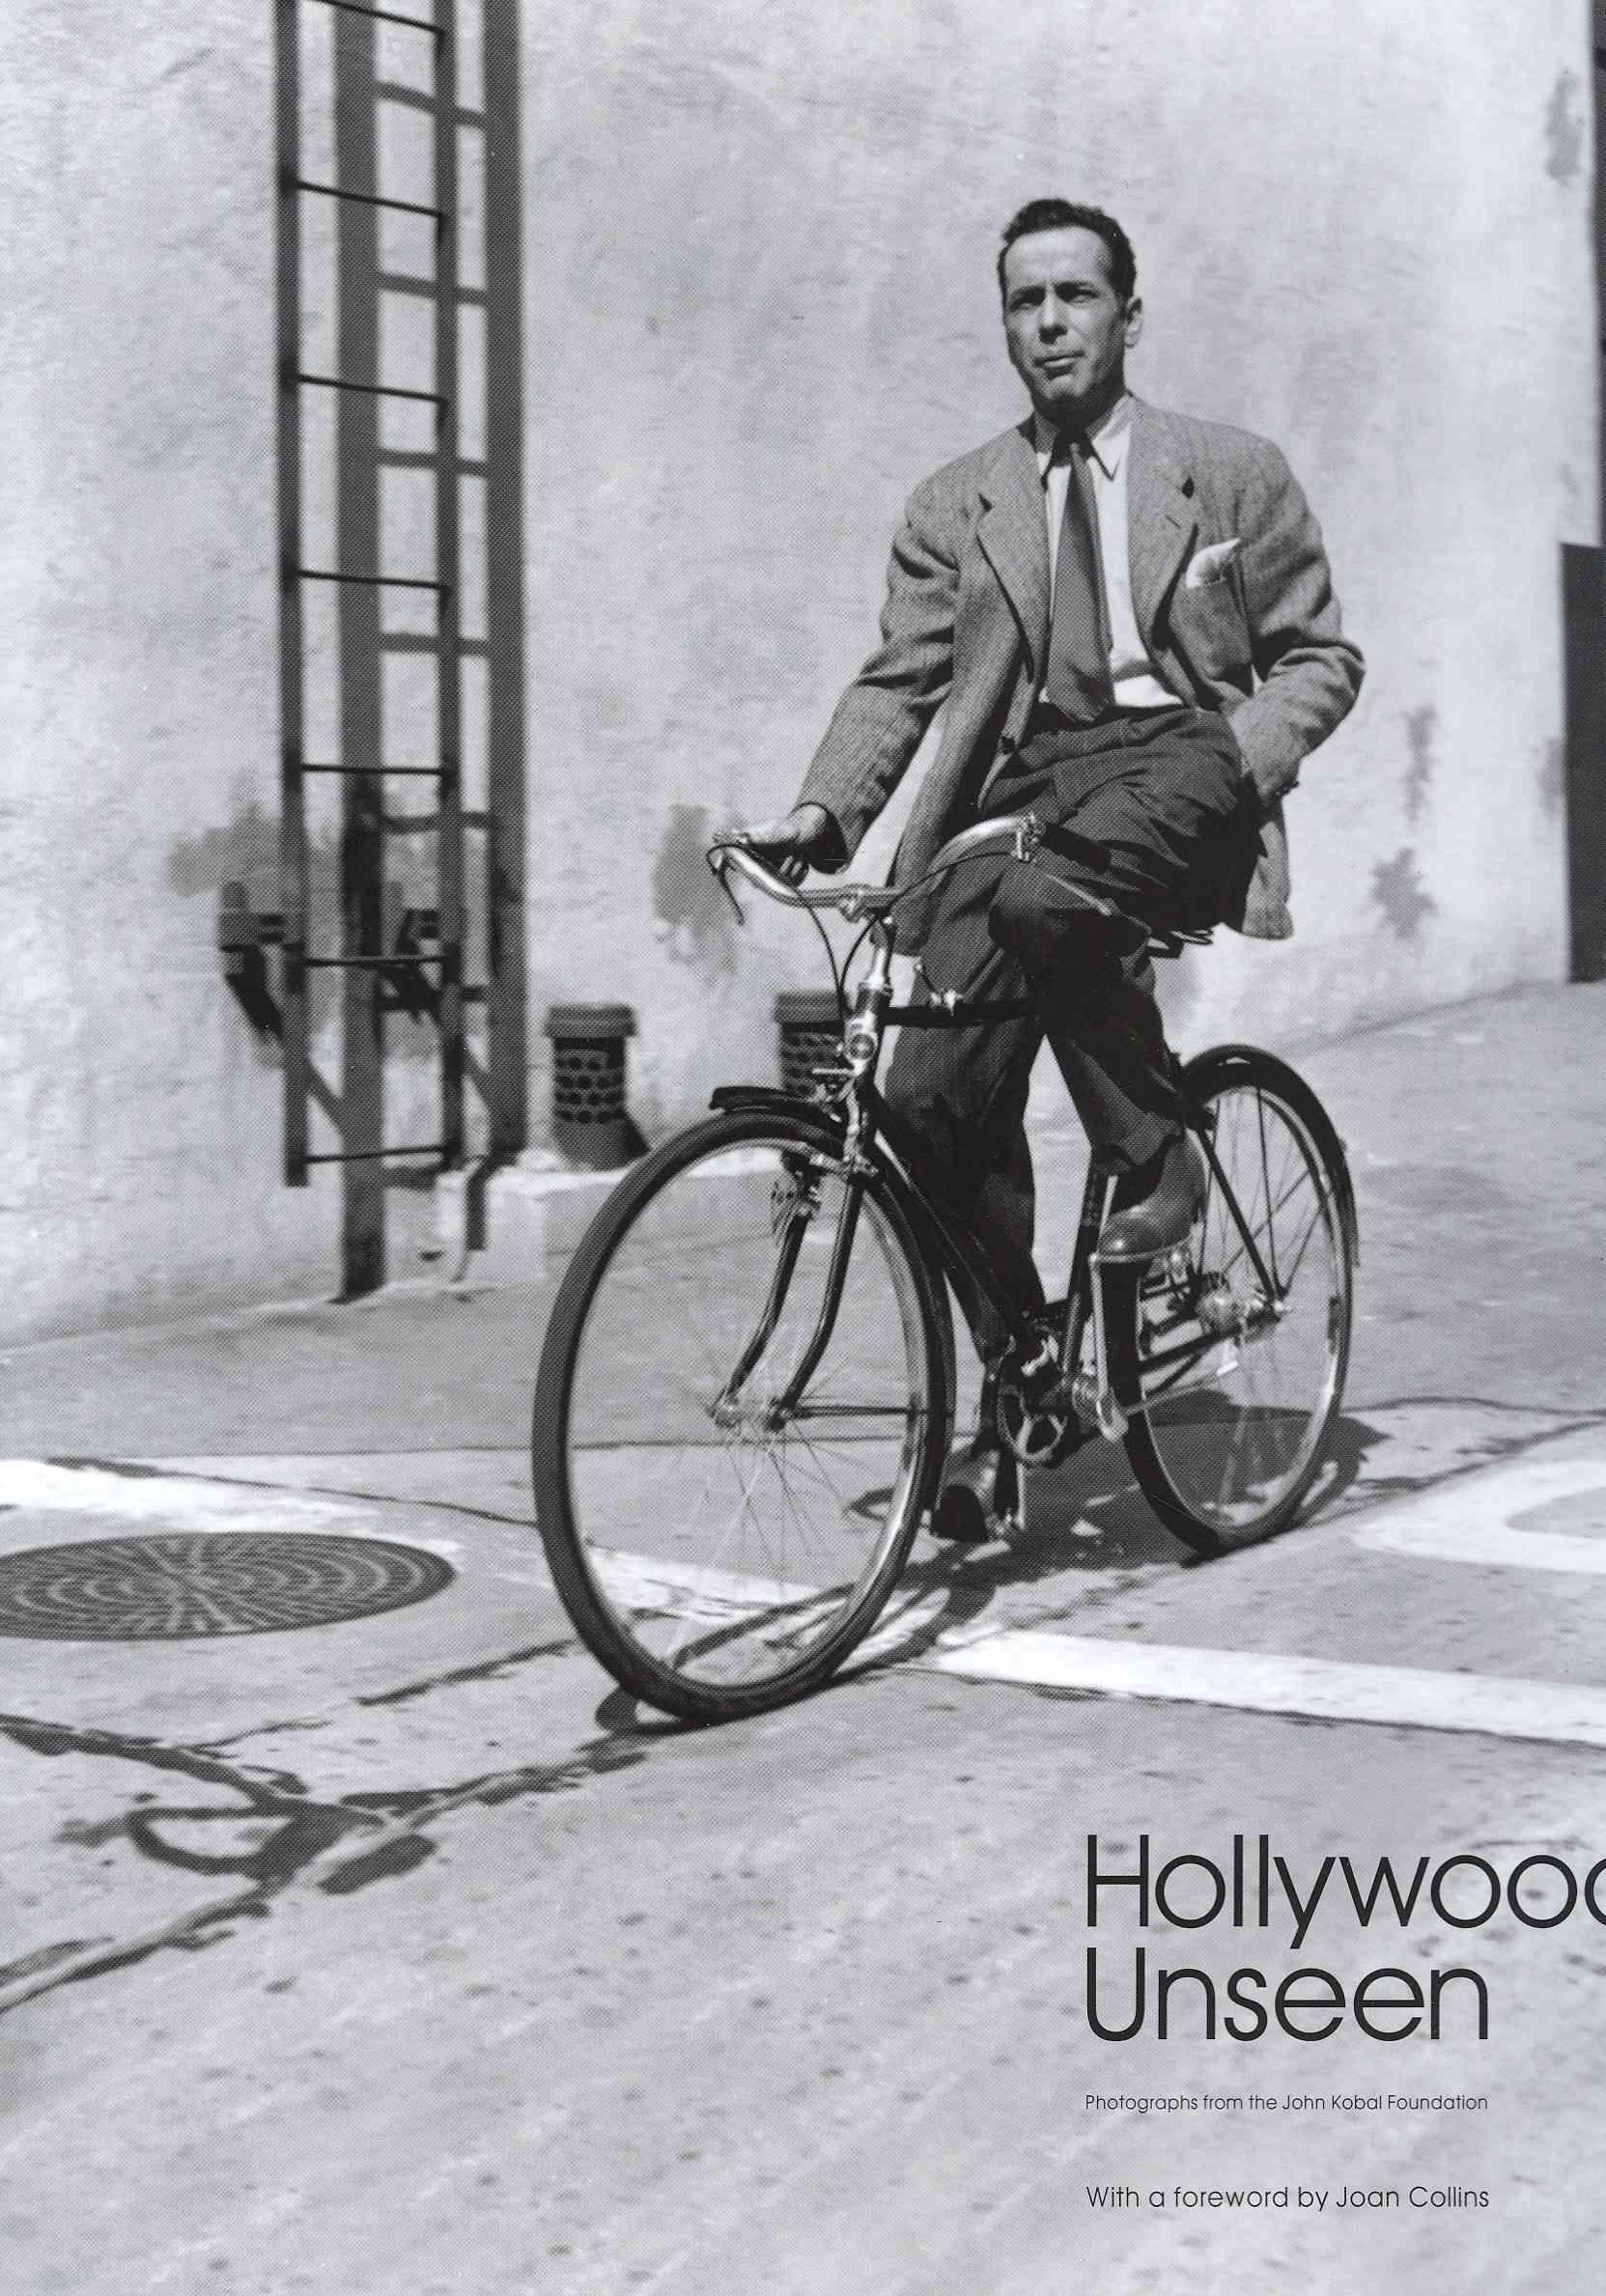 Hollywood Unseen By Dance, Robert